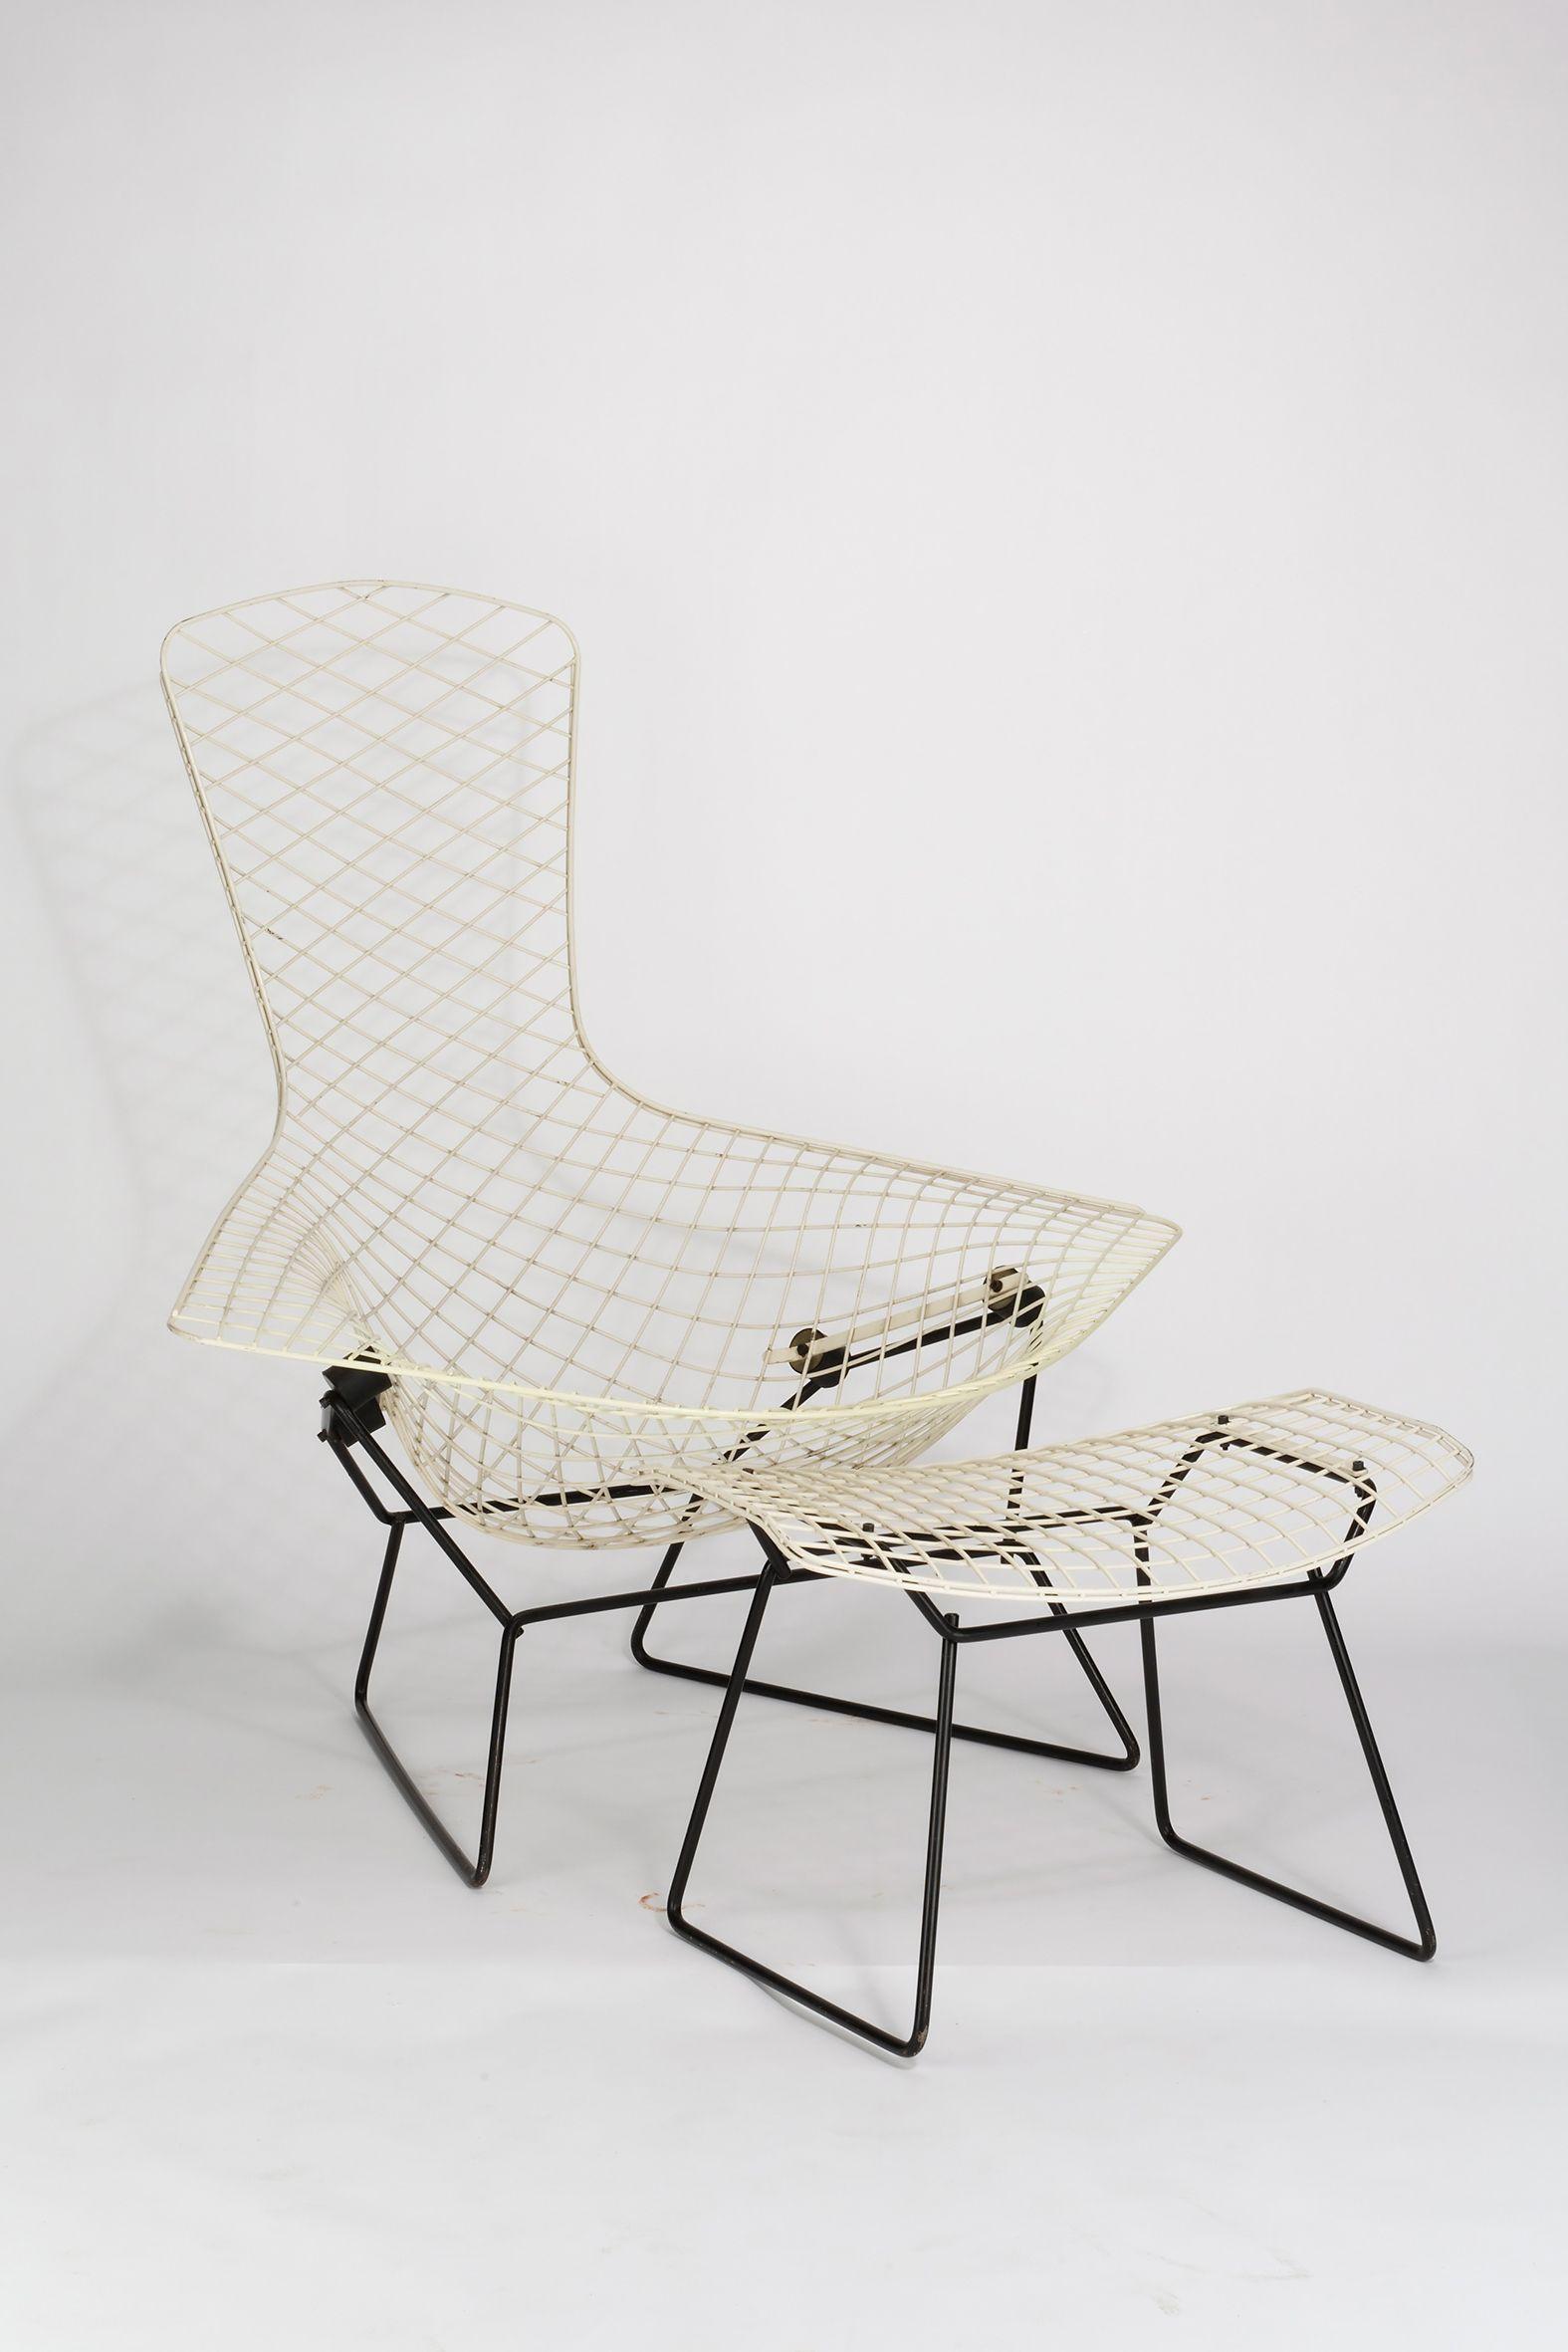 Harry Bertoia Bird Chair Modell Nr 423 LU 1950 1952